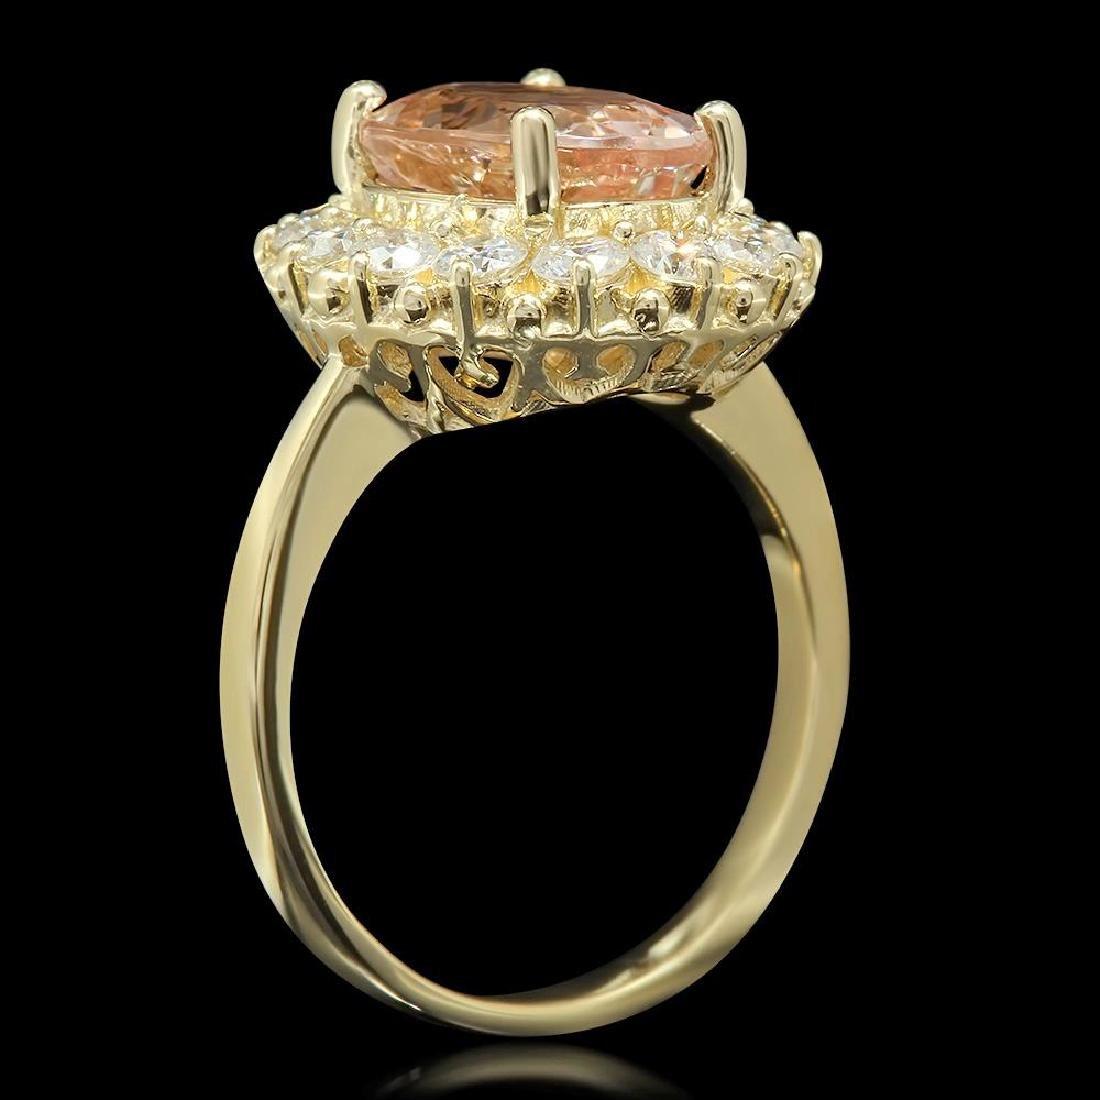 14K Gold 3.23ct Morganite 1.09ct Diamond Ring - 2